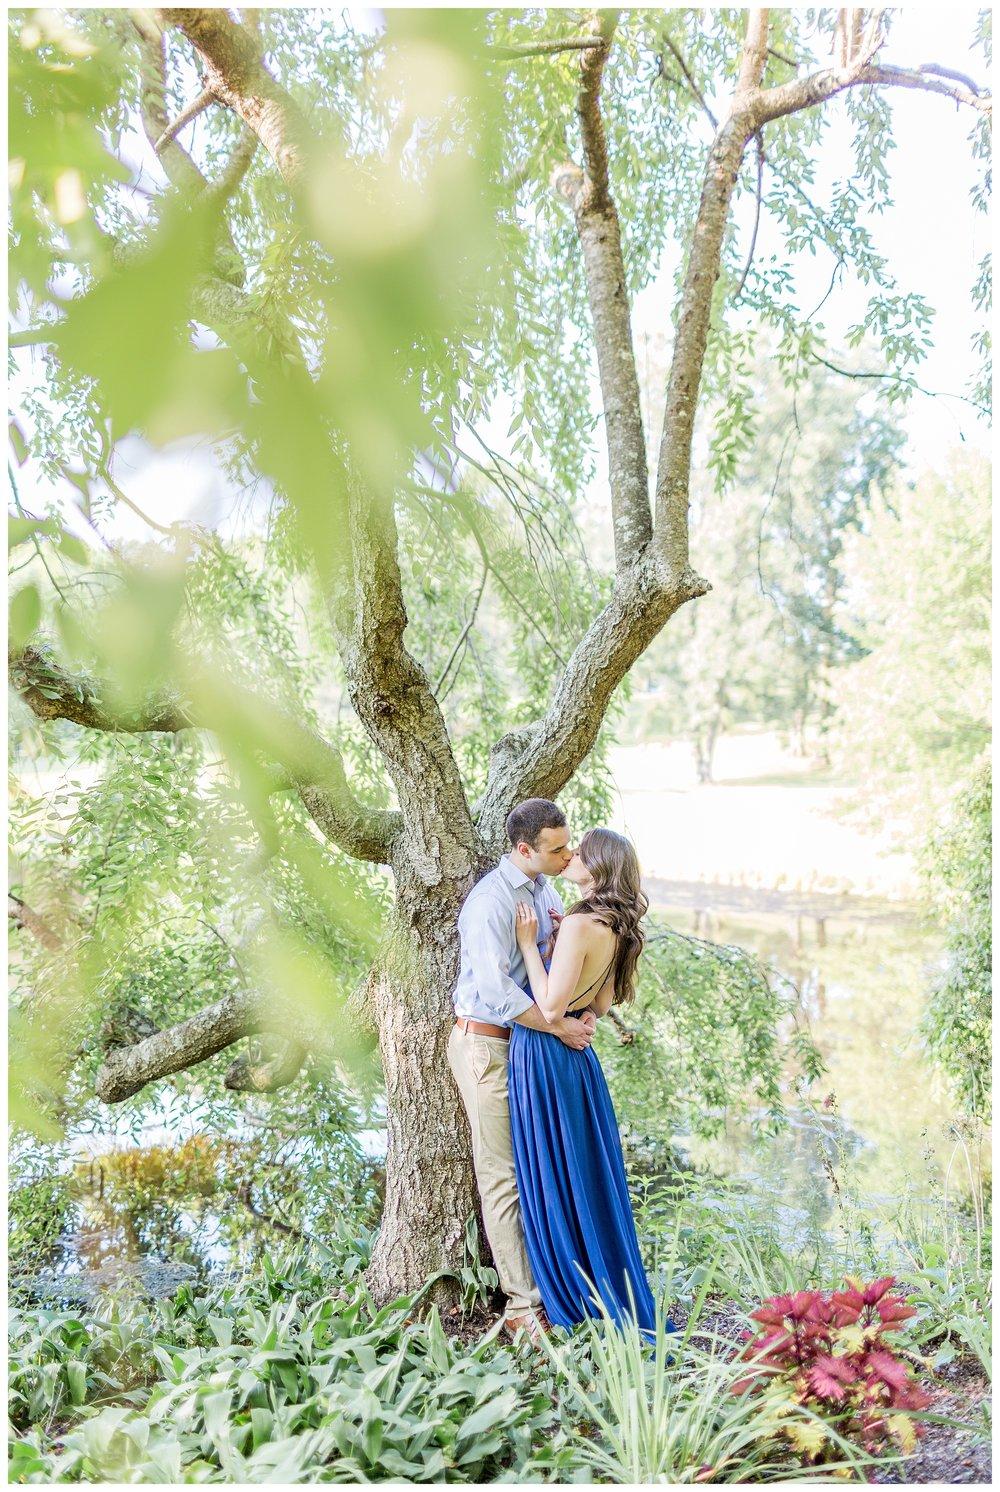 Meadowlark Botanical Garden Engagement | Virginia Wedding Photographer Kir Tuben_0022.jpg